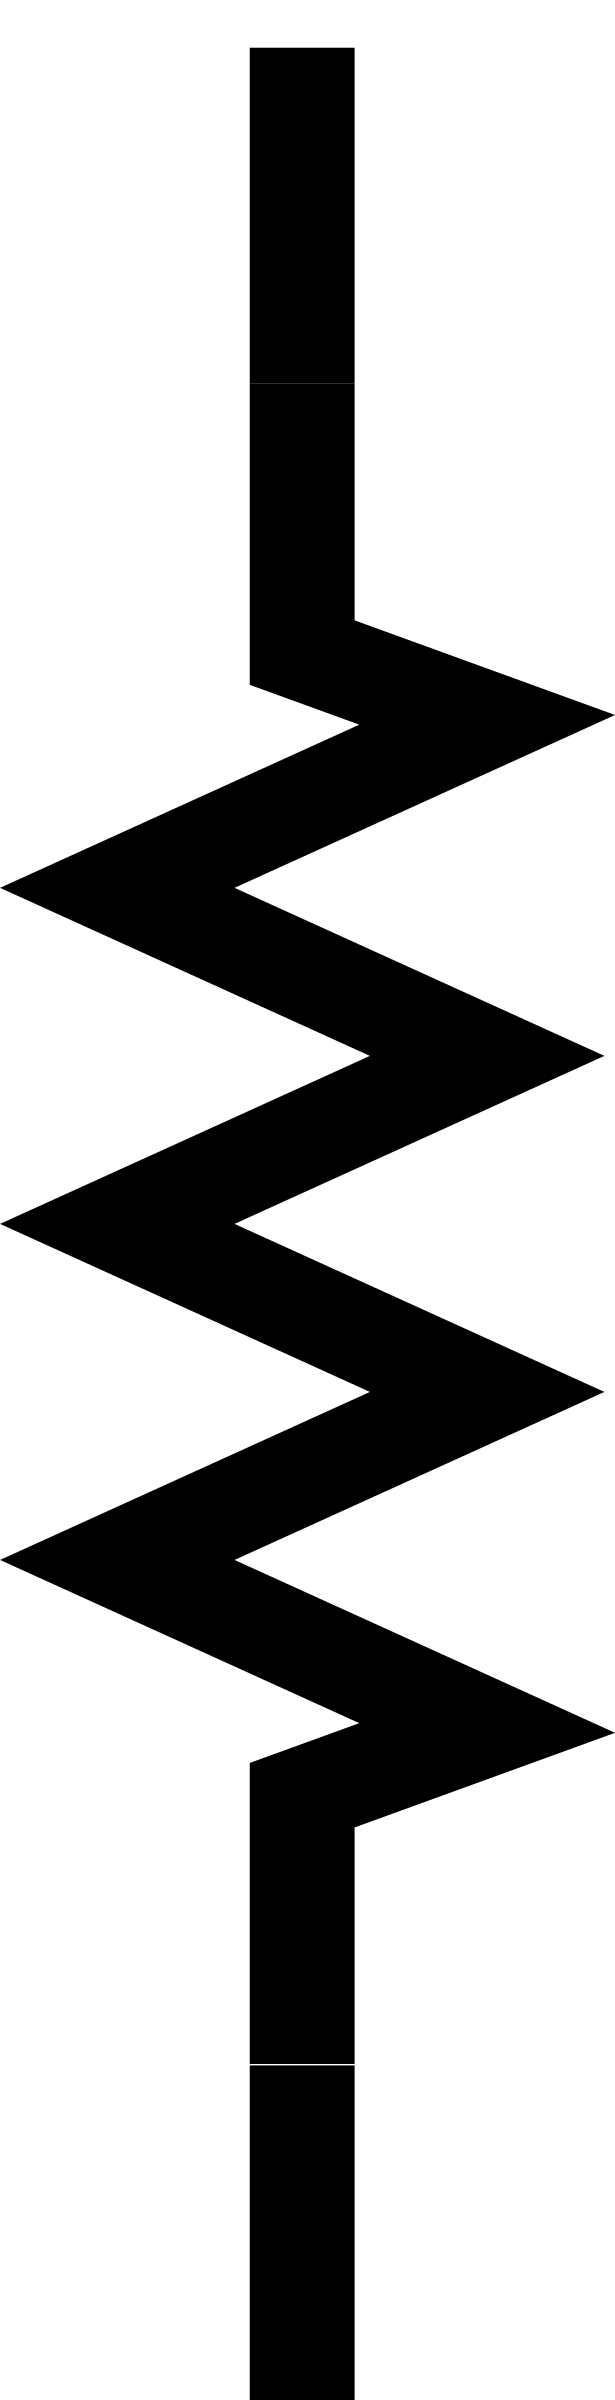 Schematic Symbol For Resistor.